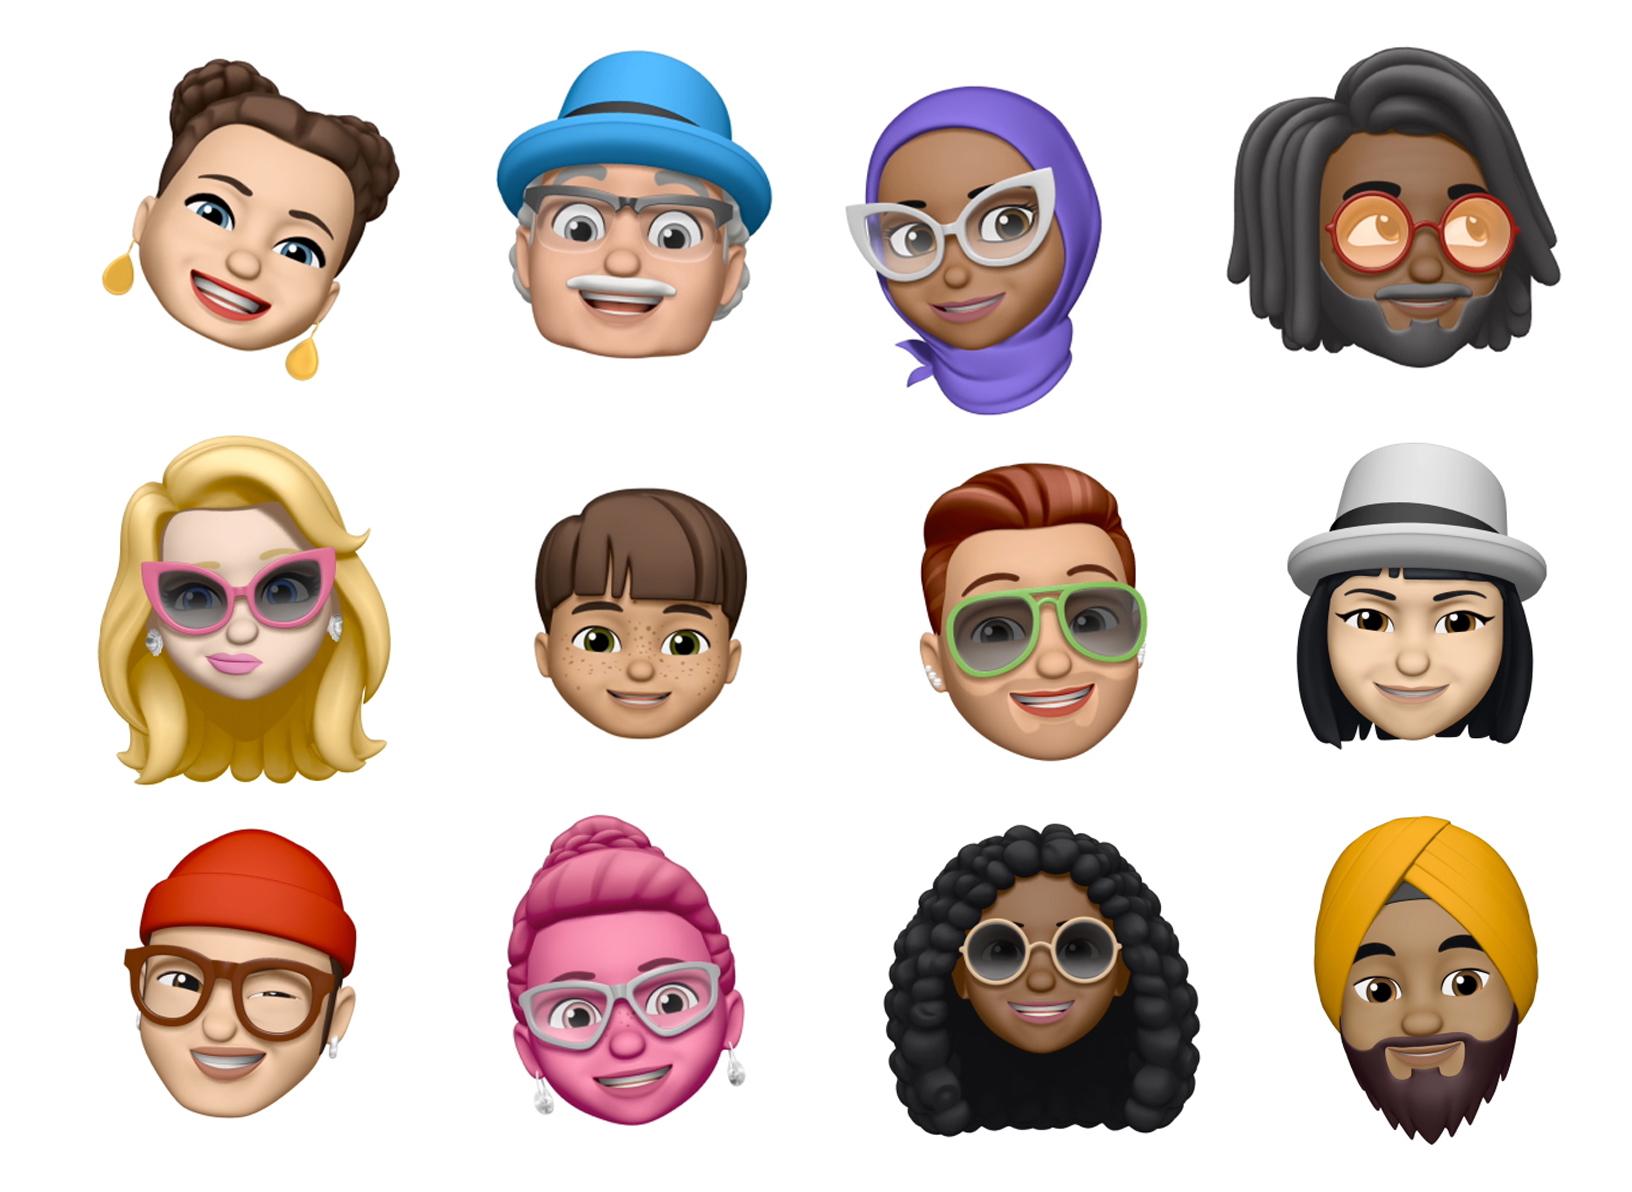 Example of a diverse set of Memoji faces